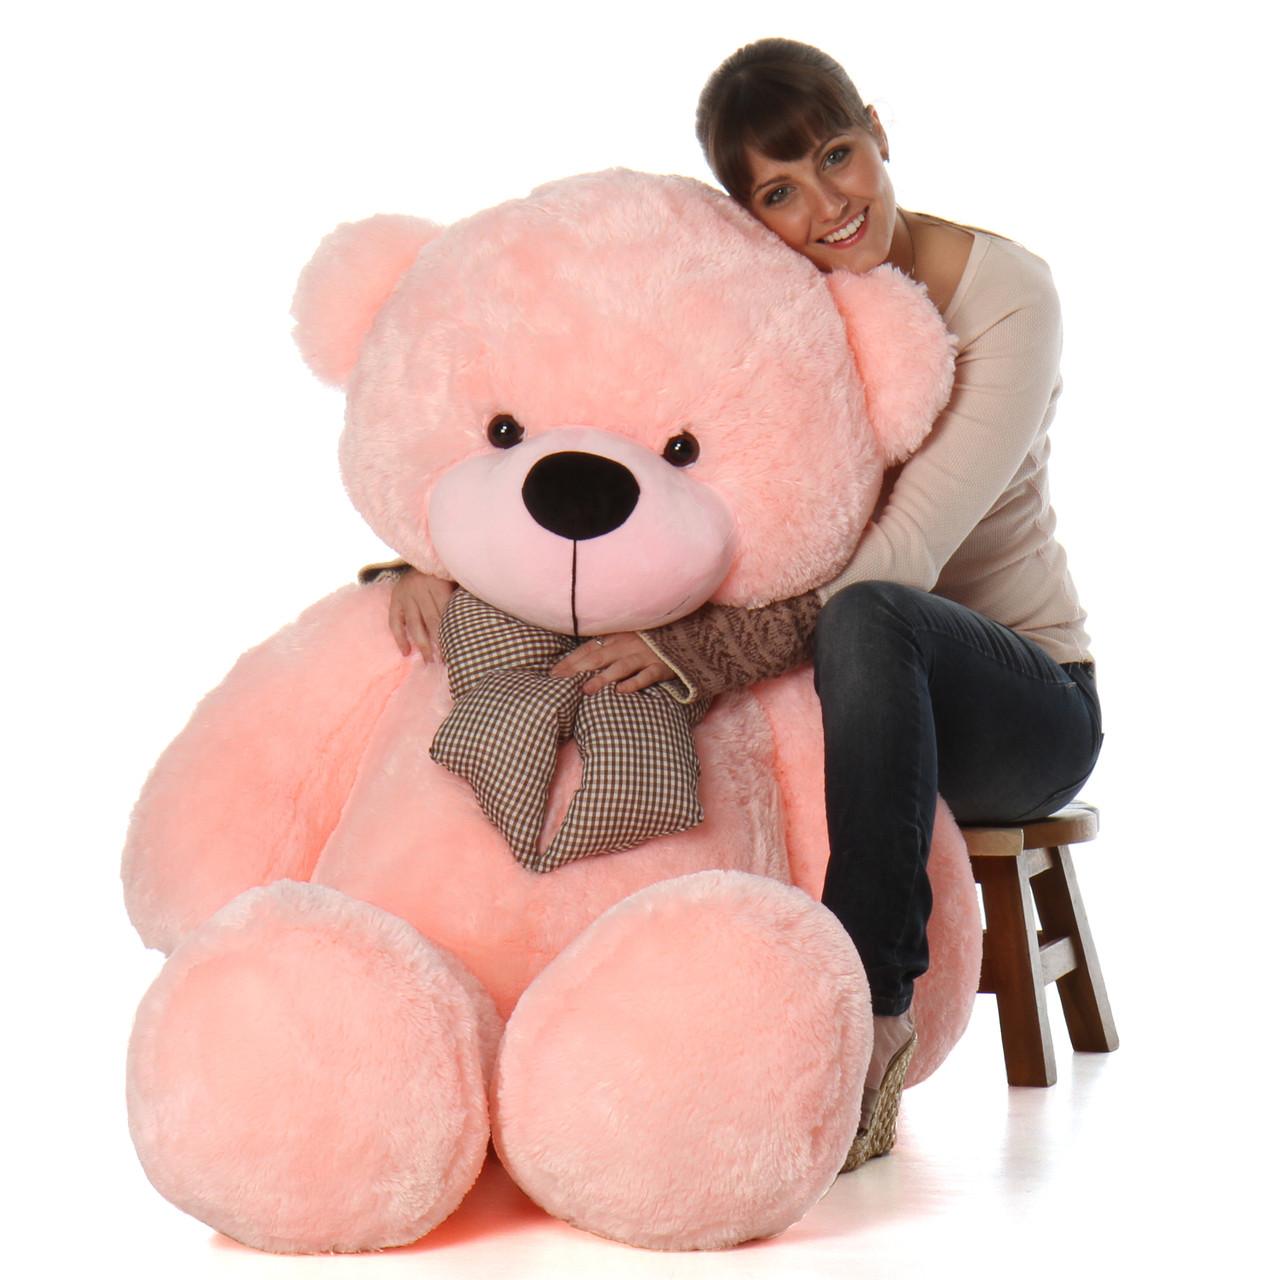 Lady Cuddles 60 Pink Huge Stuffed Teddy Bear Giant